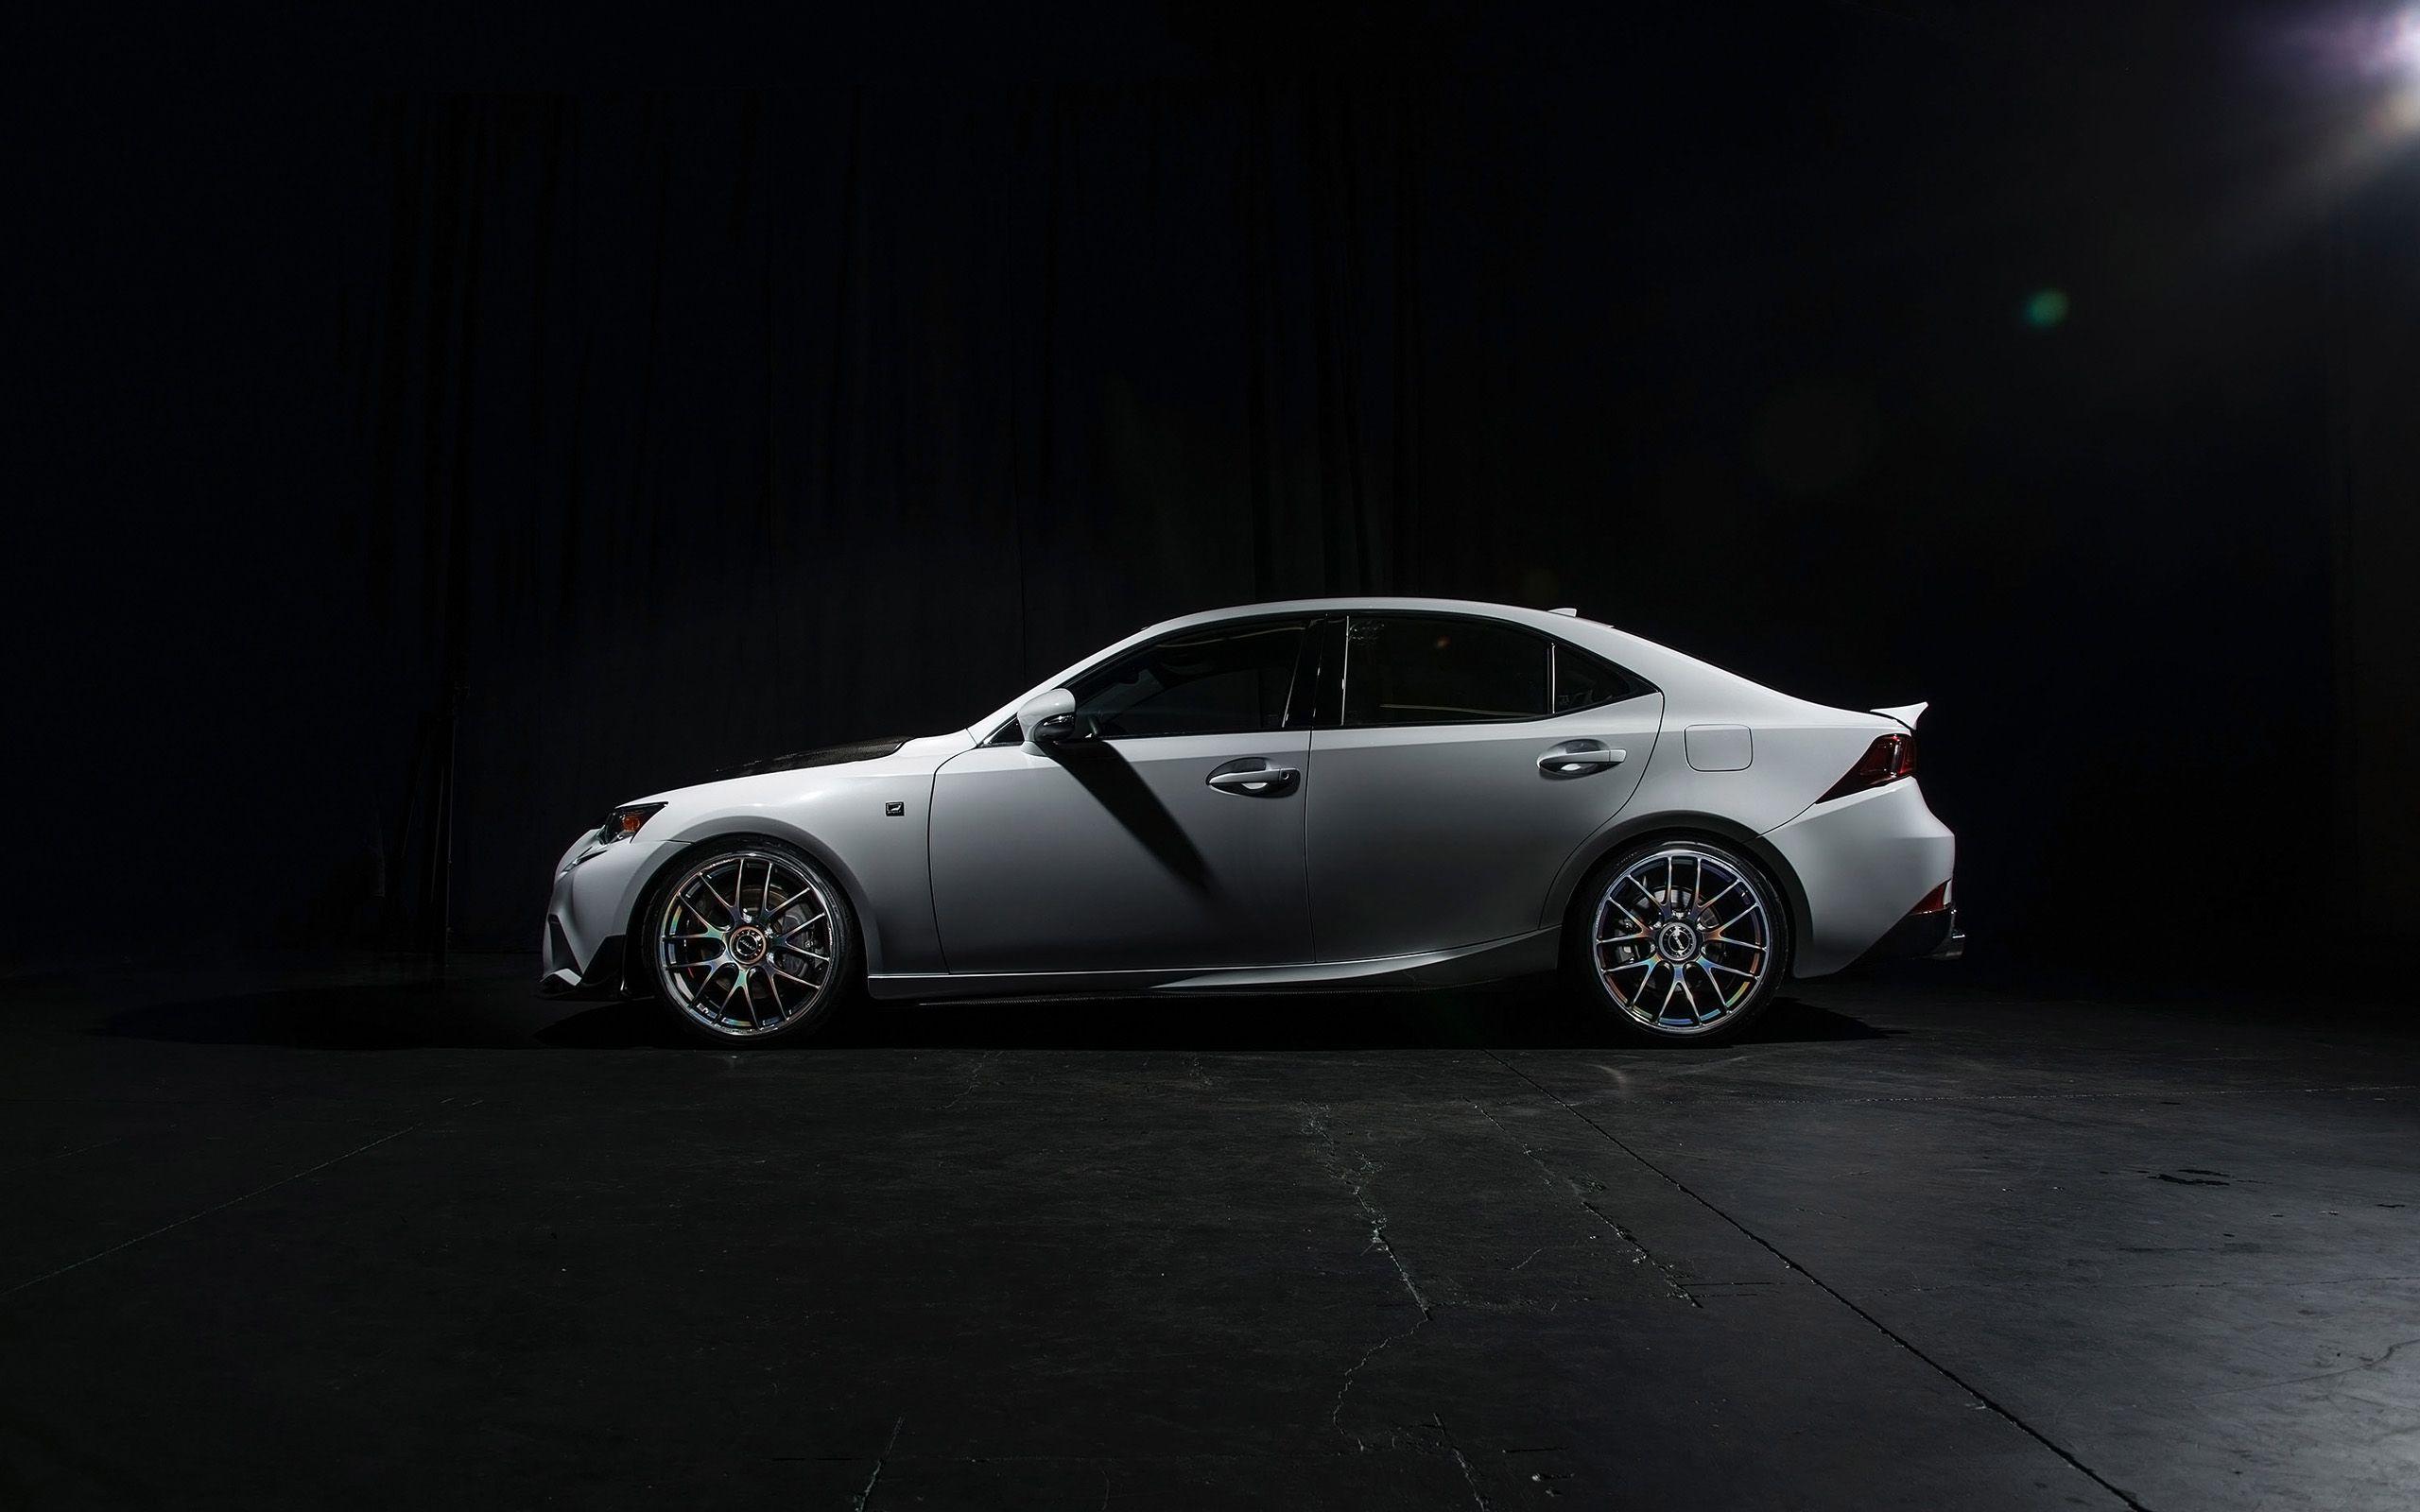 2014 Lexus Is 350 F Sport By Seibon Carbon Tuning I S Lexus Lexus Dealer Cool Cars